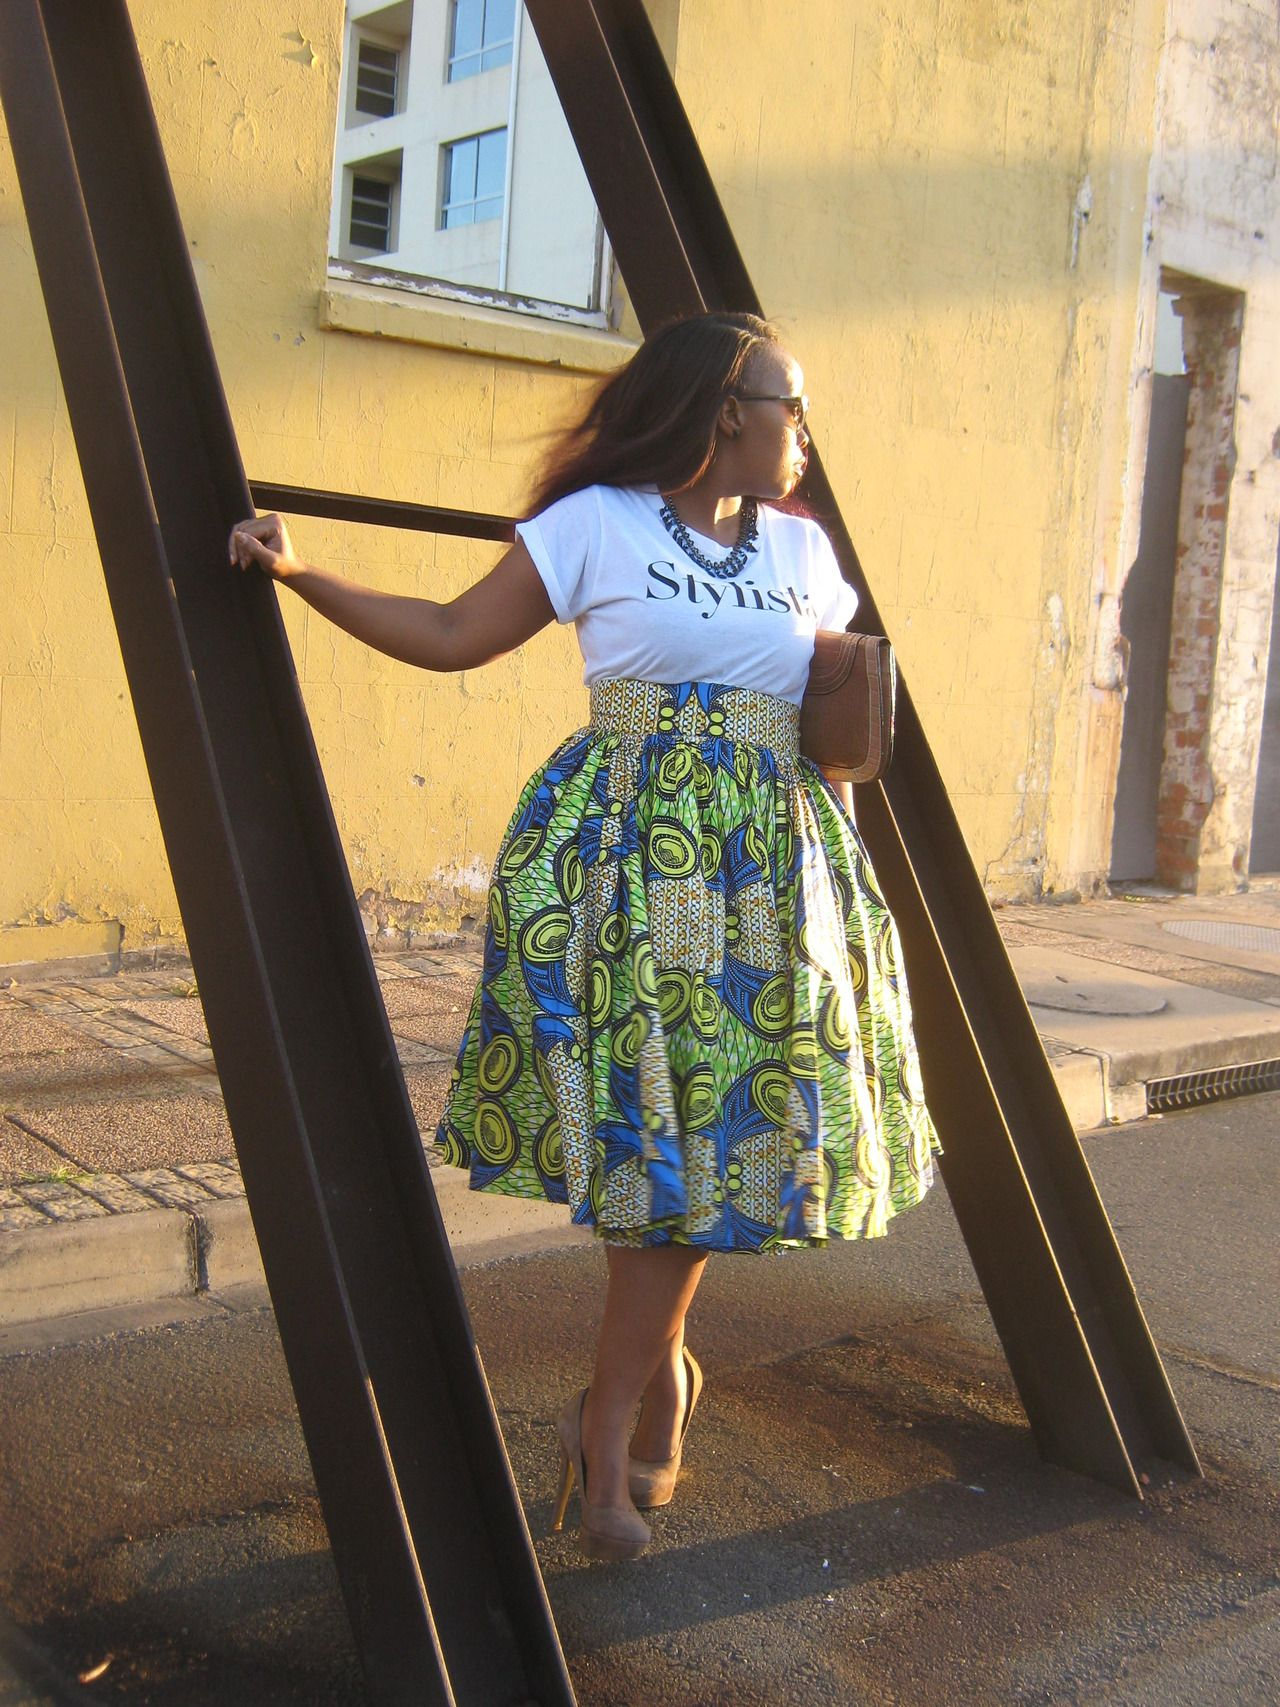 blackfashion: Phumelele Nsele From KZN/Mandeni South Africa Wearing - Extreem Glamour Skirt By Zamo Nana Nsele, Mr Price - Tee, Sunglasses - Prada, Heels Aldo http://extreemglamour.blogspot.com/